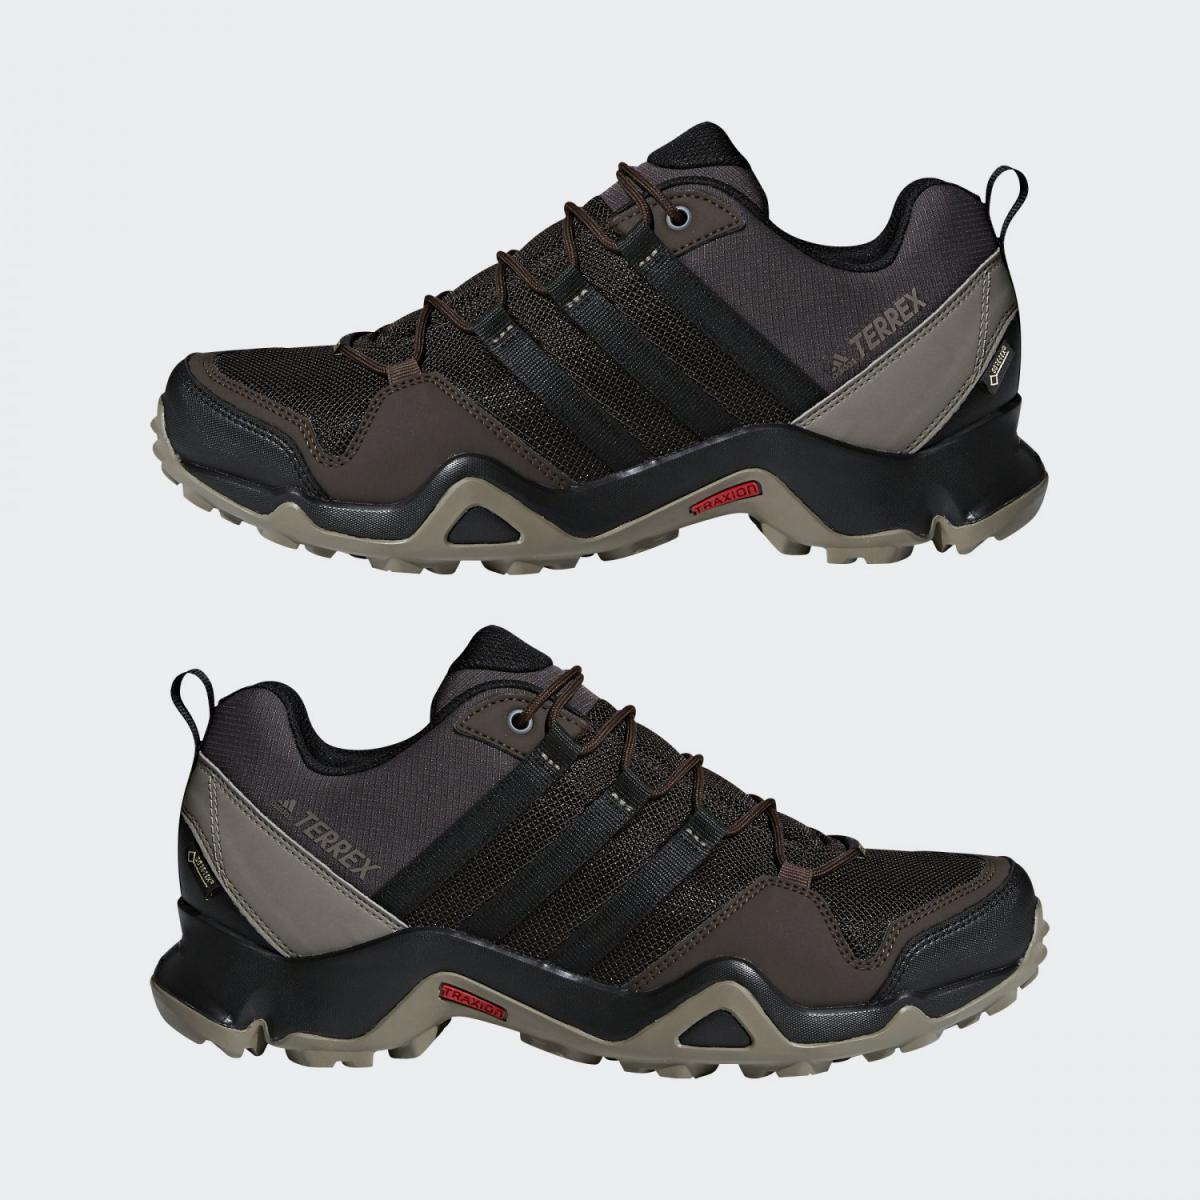 130 NWT hommes Adidas AX2R CM7716 GTX Trail ChaussuresRockadia DuramoTerrex Swift